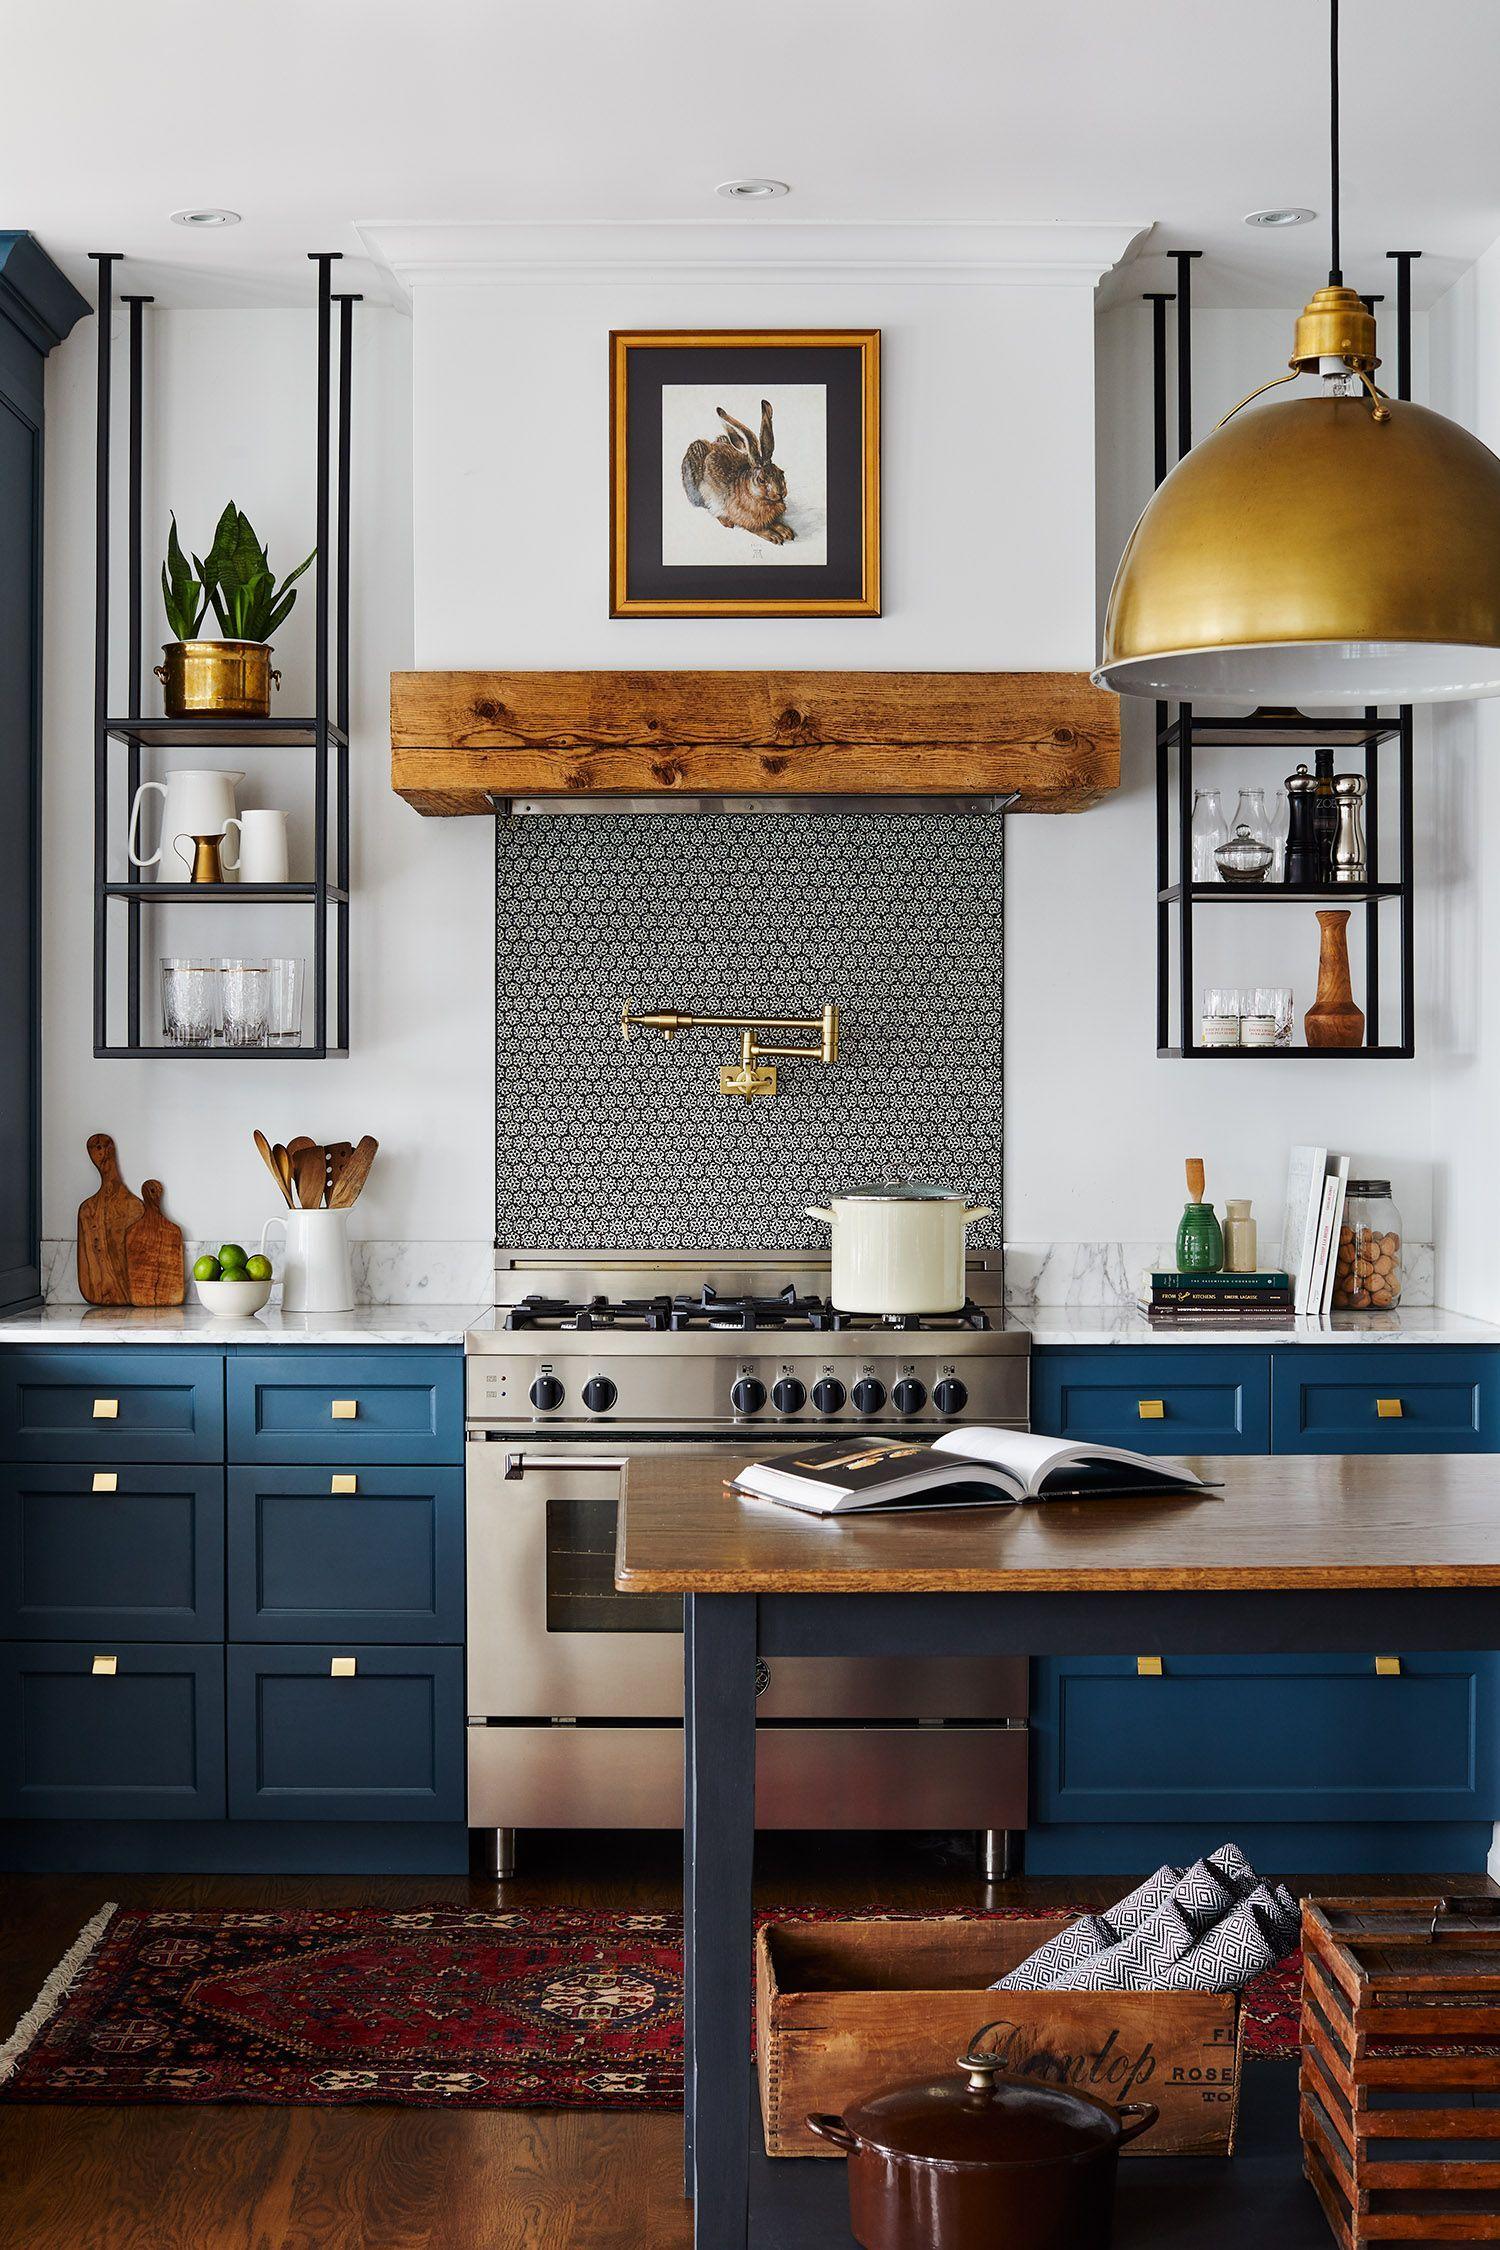 Blanc Design Kitchen Living Marine Shabby Chic Kitchen Blue In 2020 Kitchen Interior Kitchen Inspirations Interior Design Kitchen